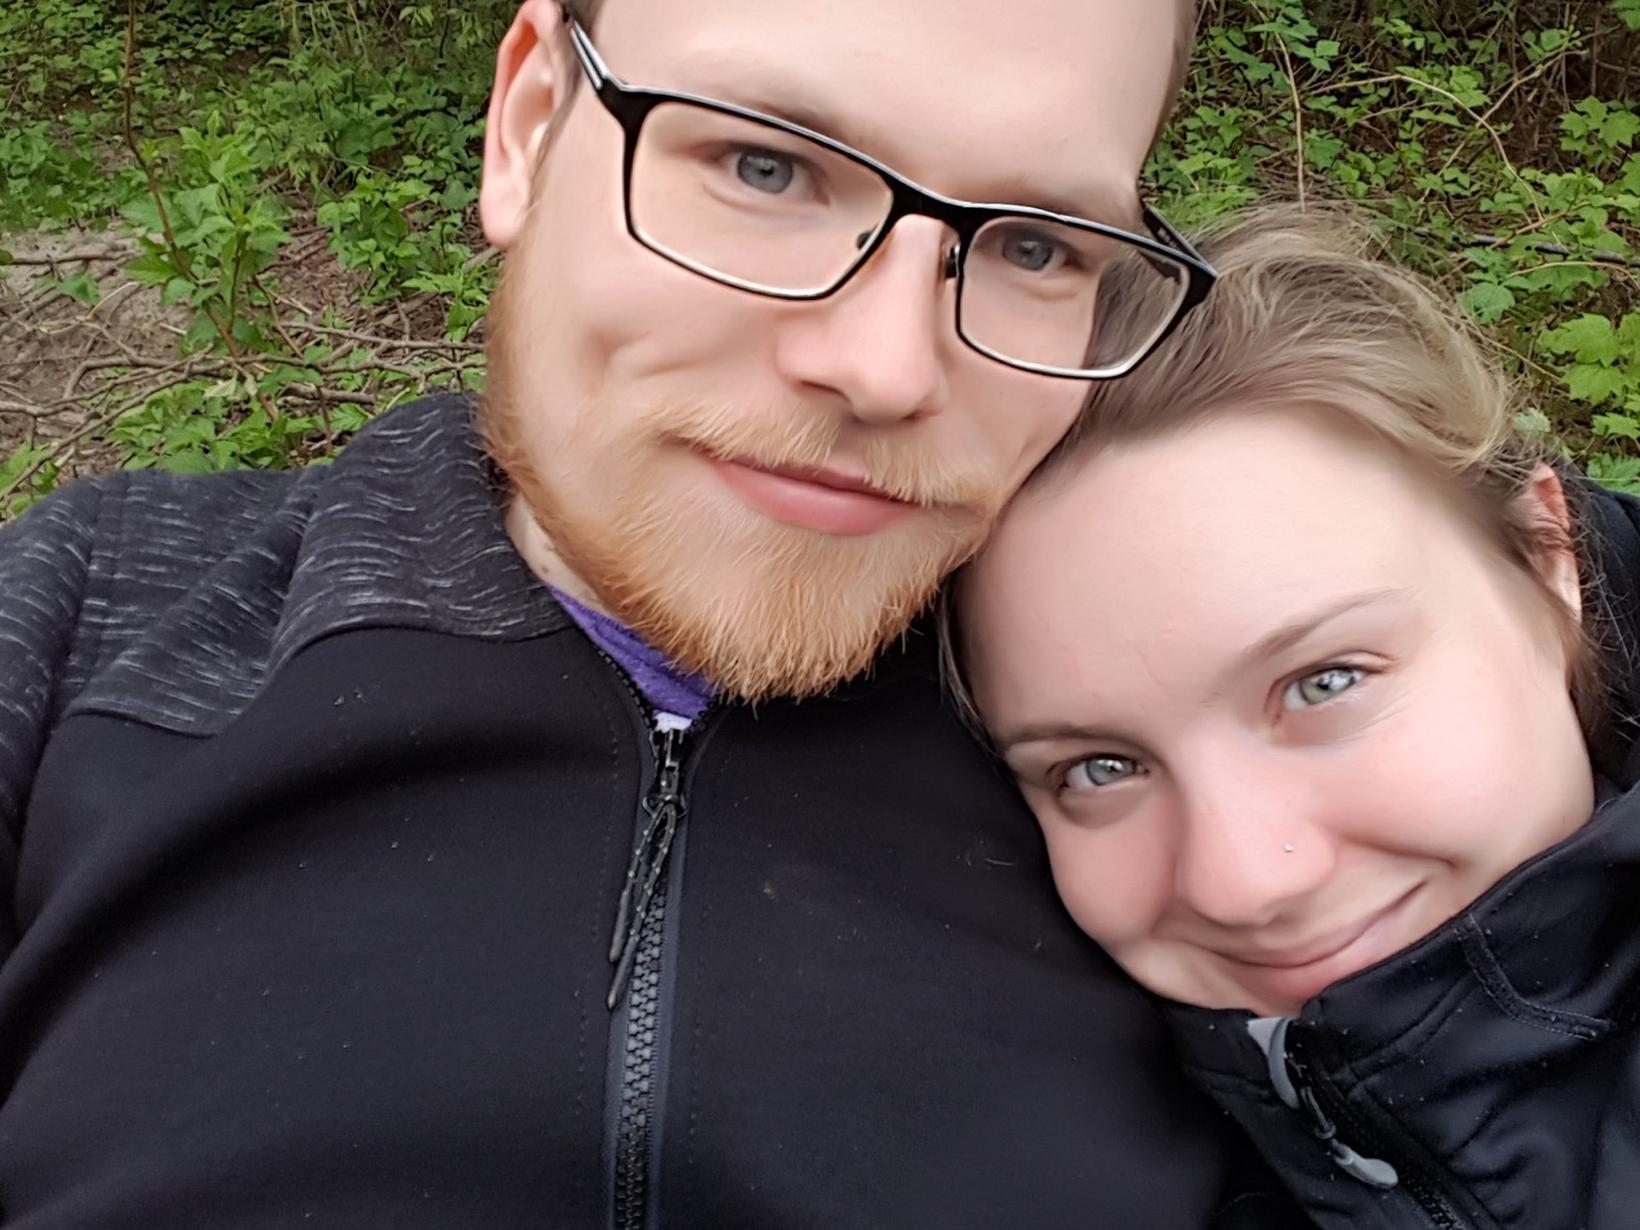 Tara & Zack from Vancouver, British Columbia, Canada